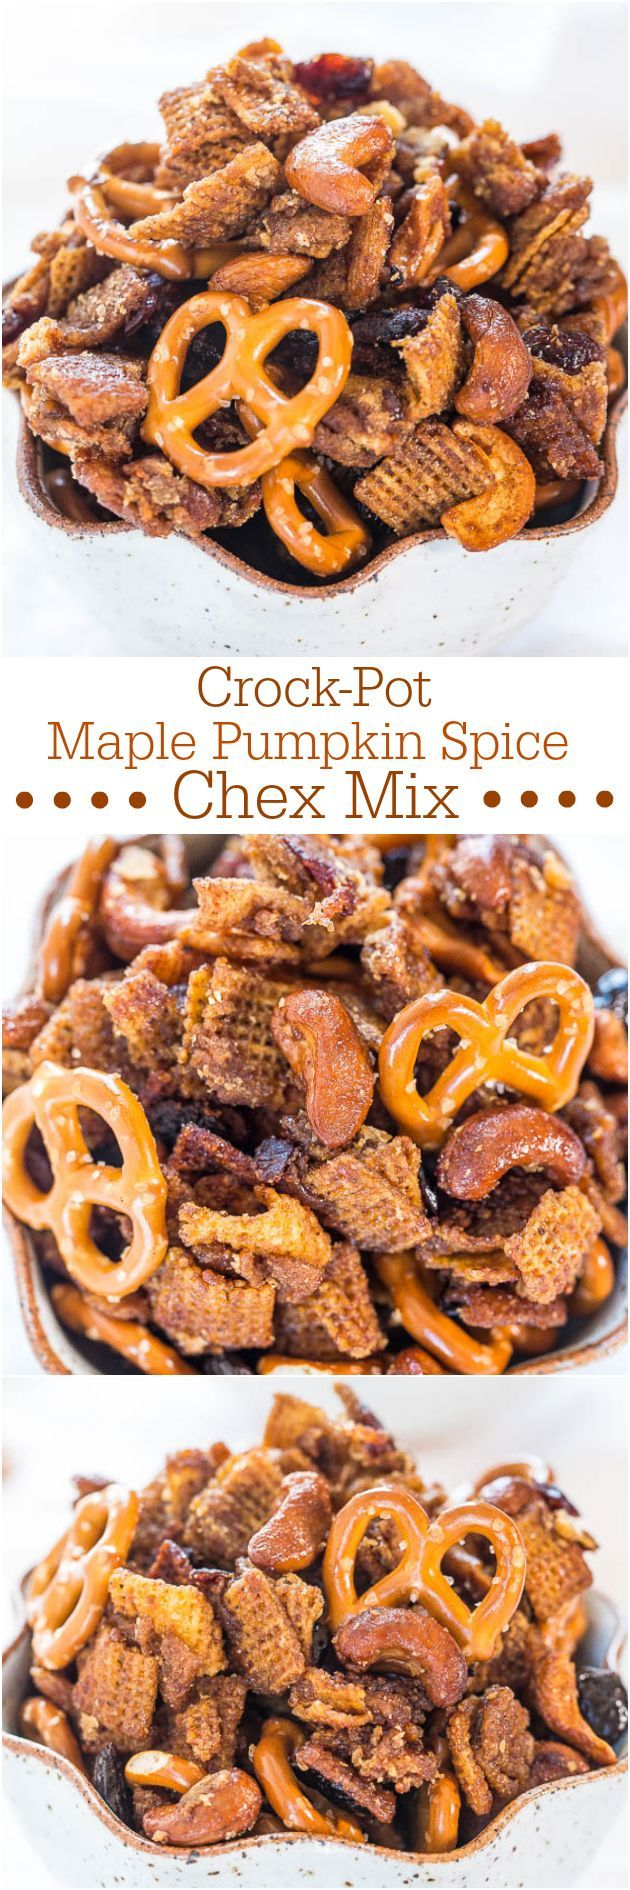 Crock-Pot Maple Pumpkin Spice Chex Mix   Pumpkins, Spice and Fall